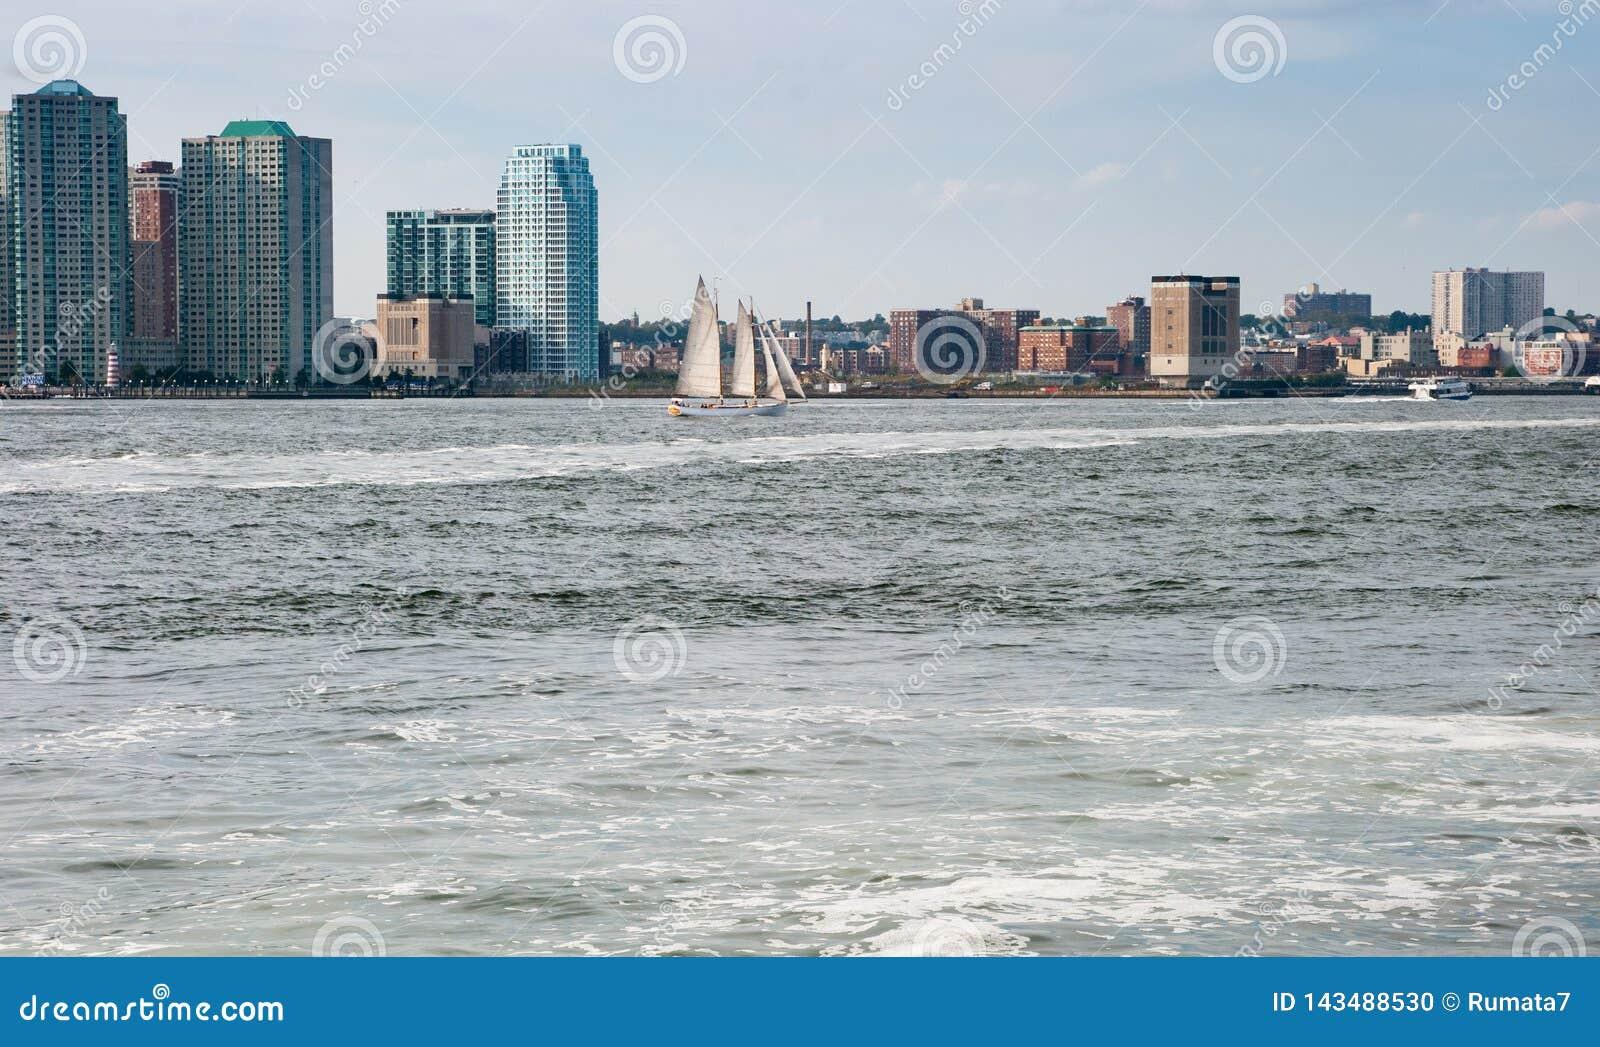 Hudson Bay New York.Beautiful Sailing Ship In Hudson Bay New York Manhattan S